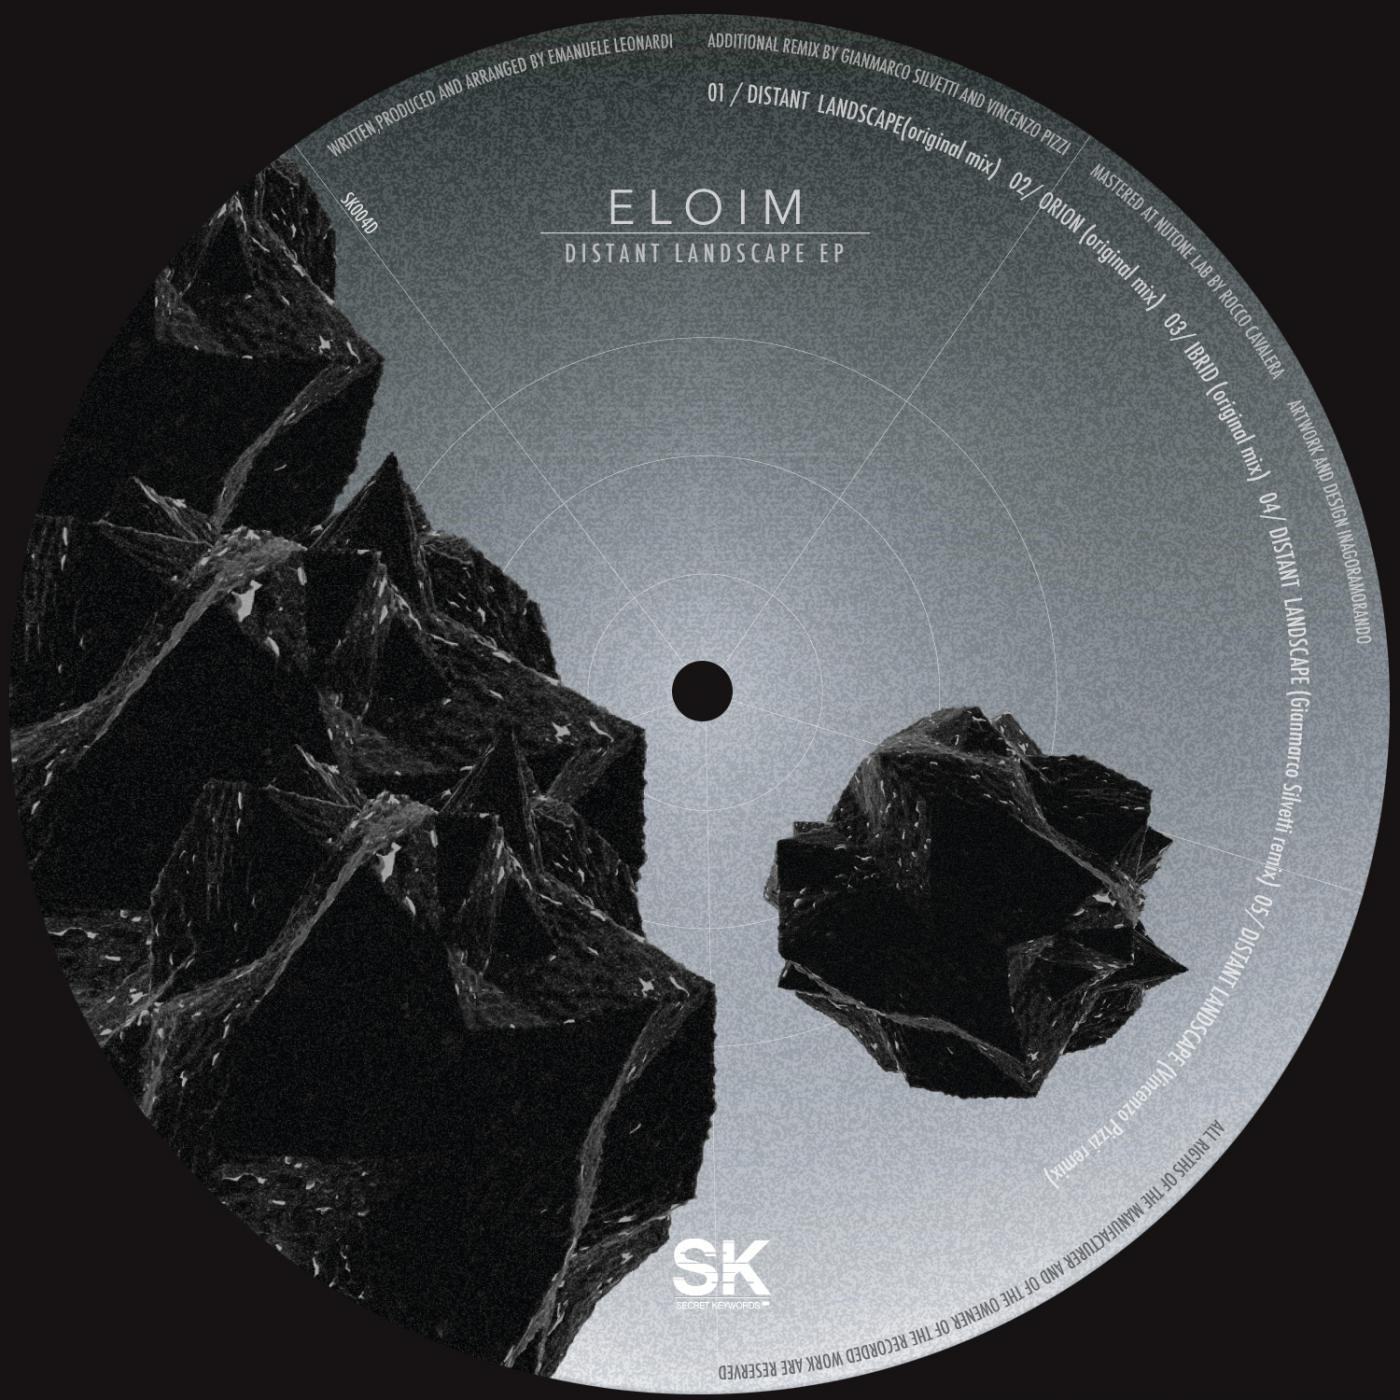 Eloim - Distant Landscape (Gianmarco Silvetti Remix)